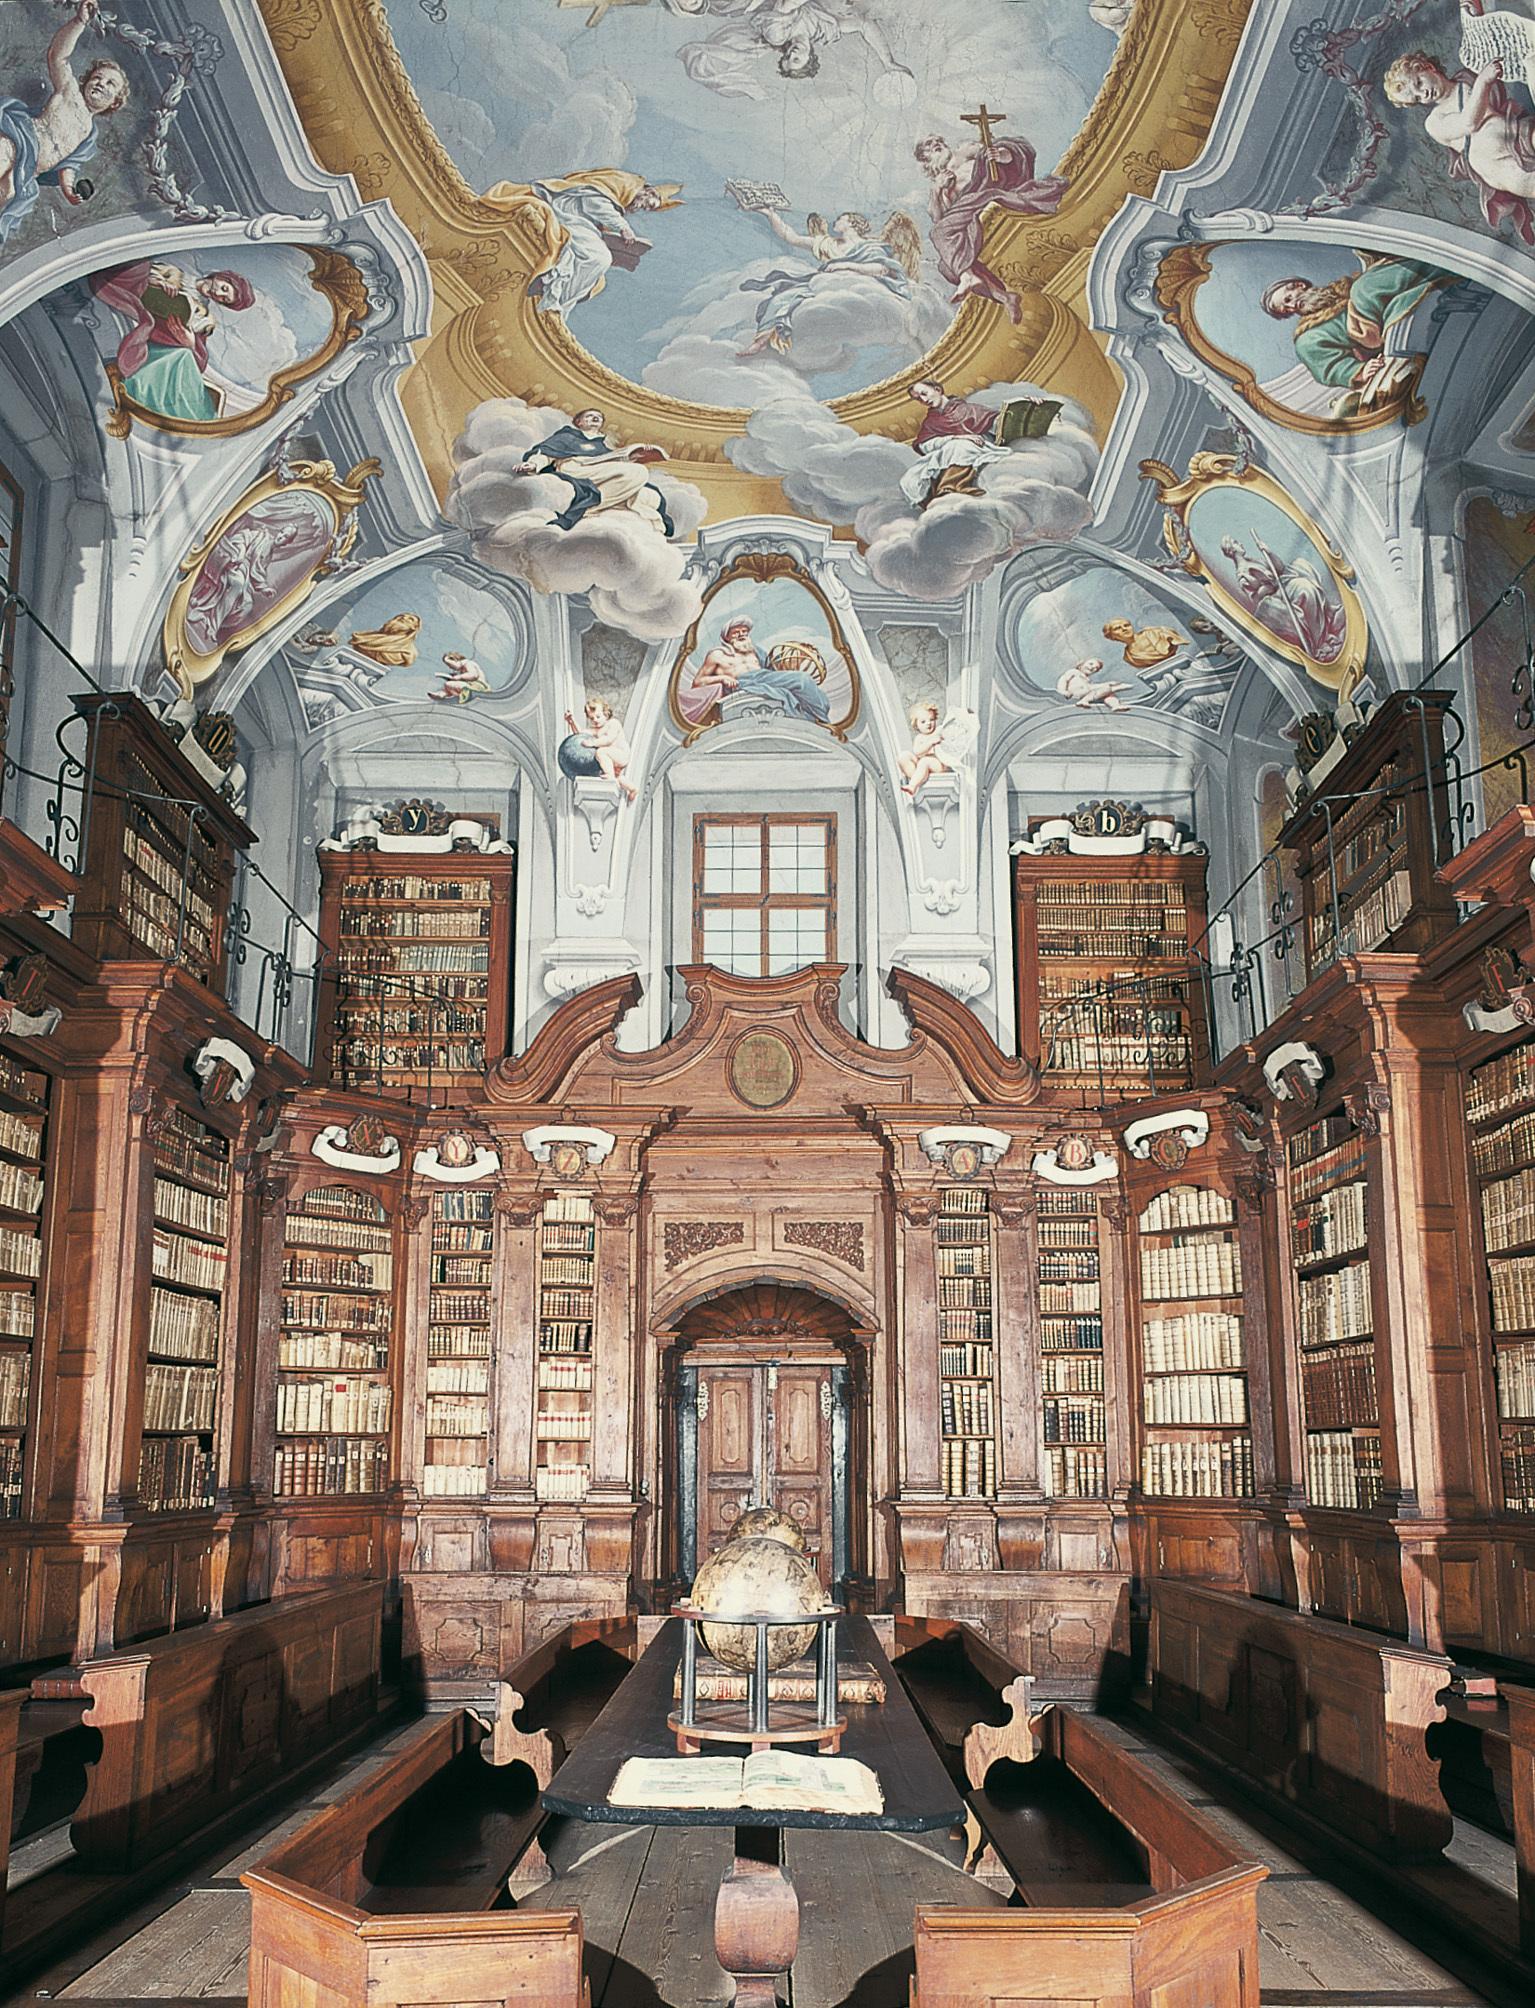 F000669-seminary_library_interior_ltb_archive_2517_orig_jpg-photo-l